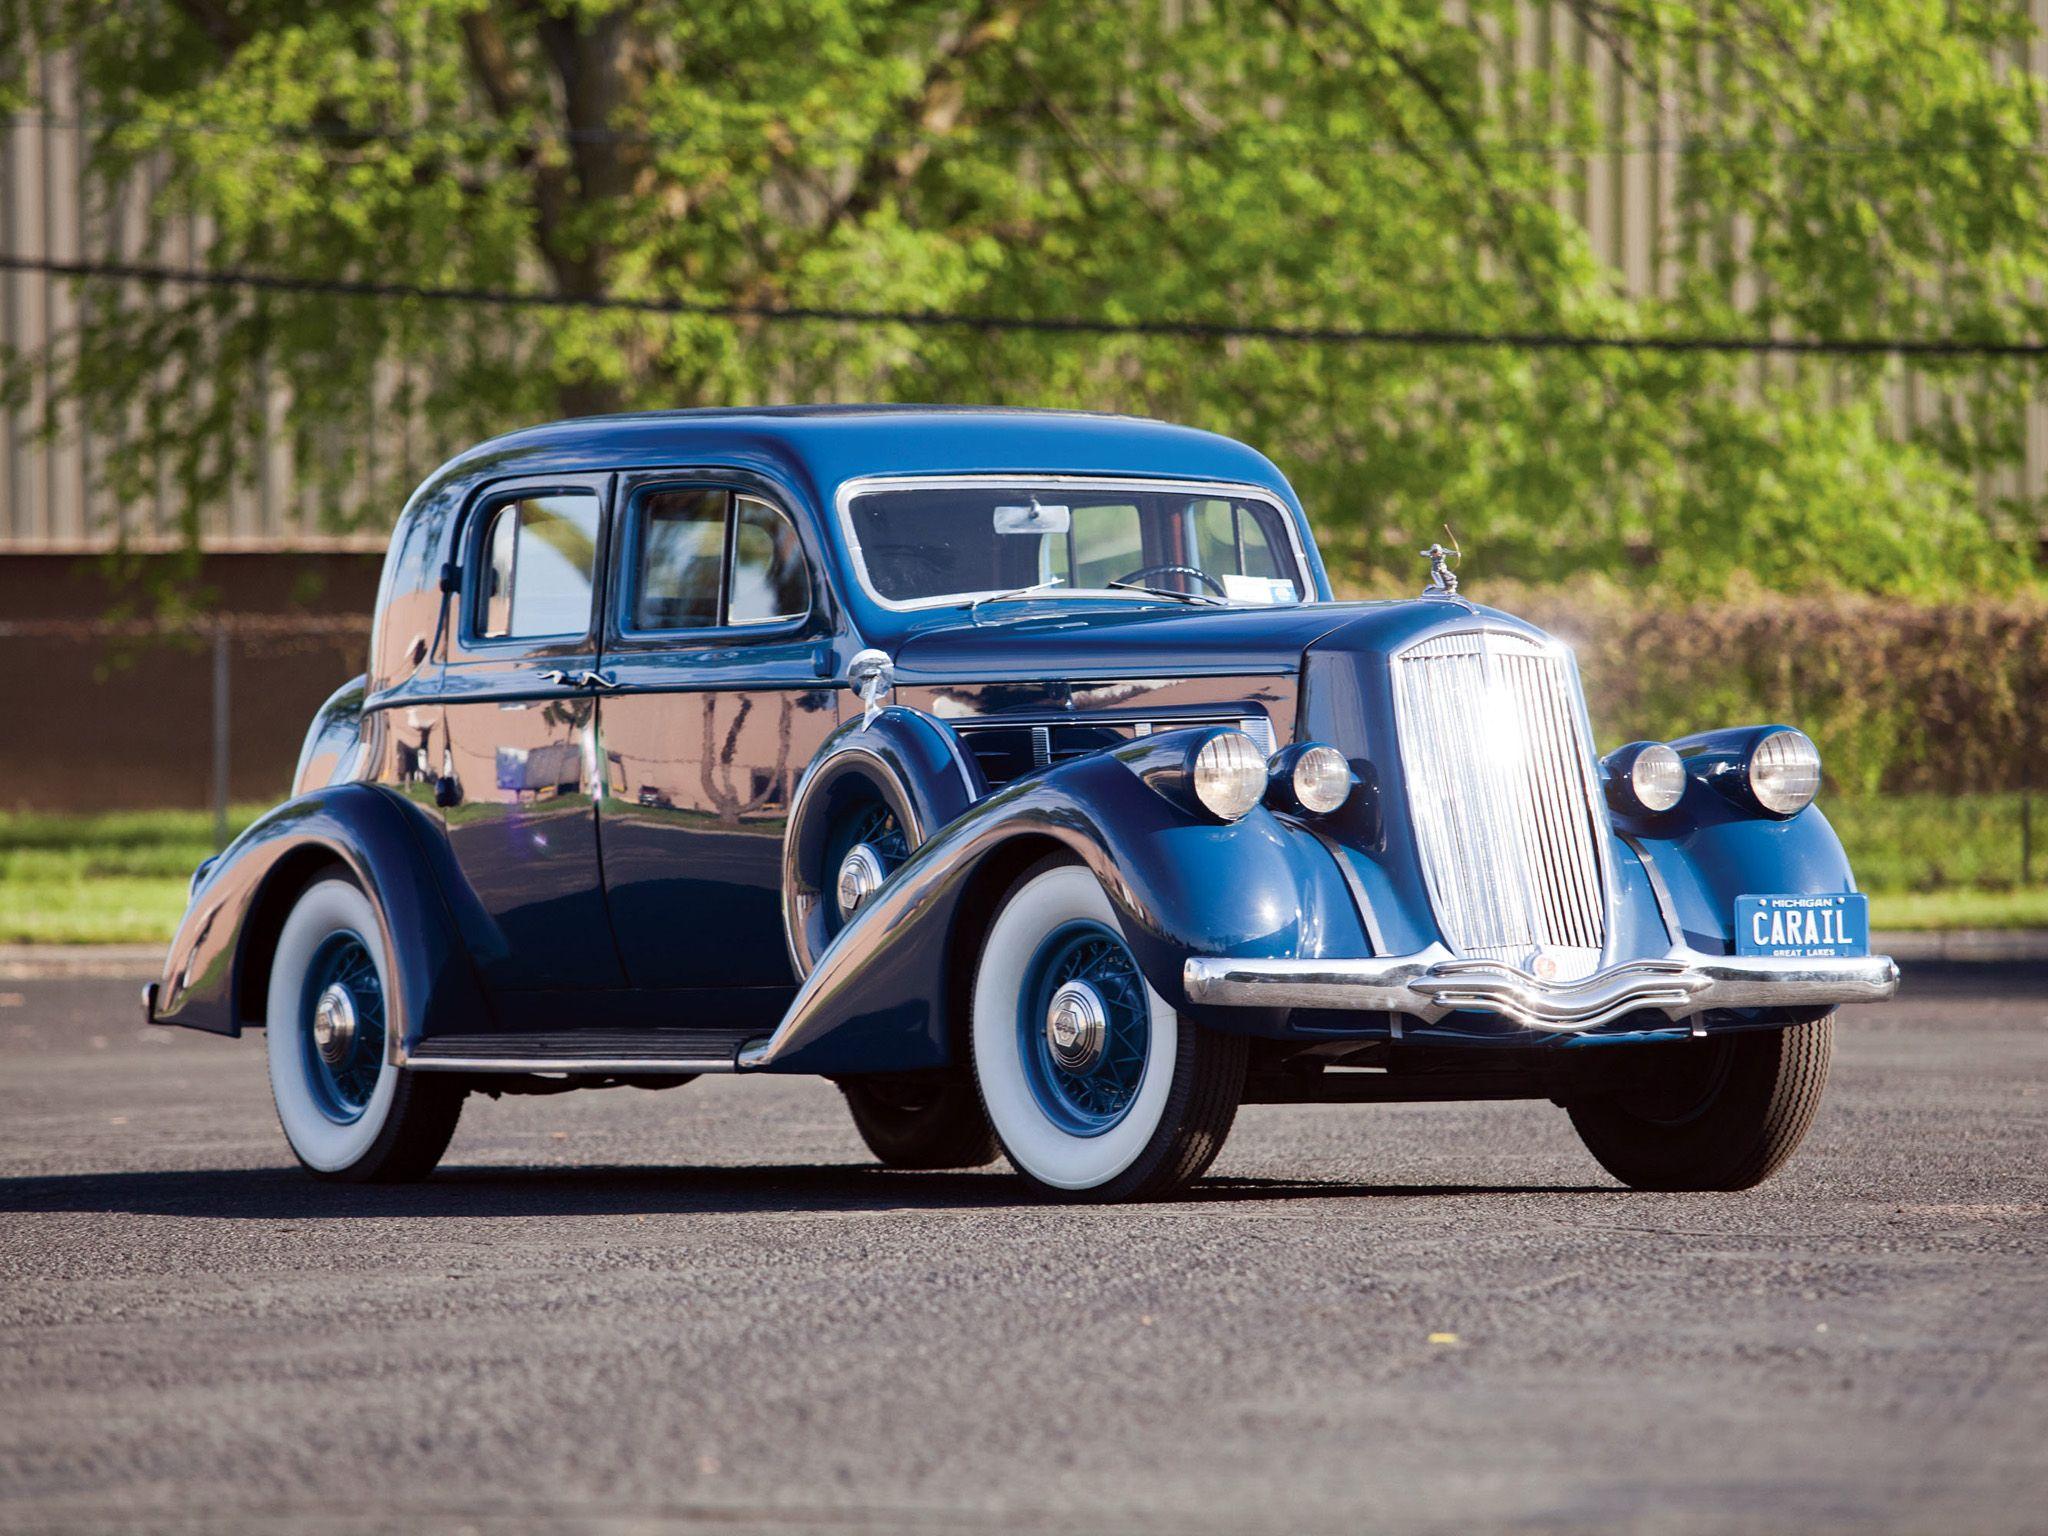 1936 Pierce Arrow Deluxe 8 Club Sedan - (Pierce-Arrow Motor Car ...